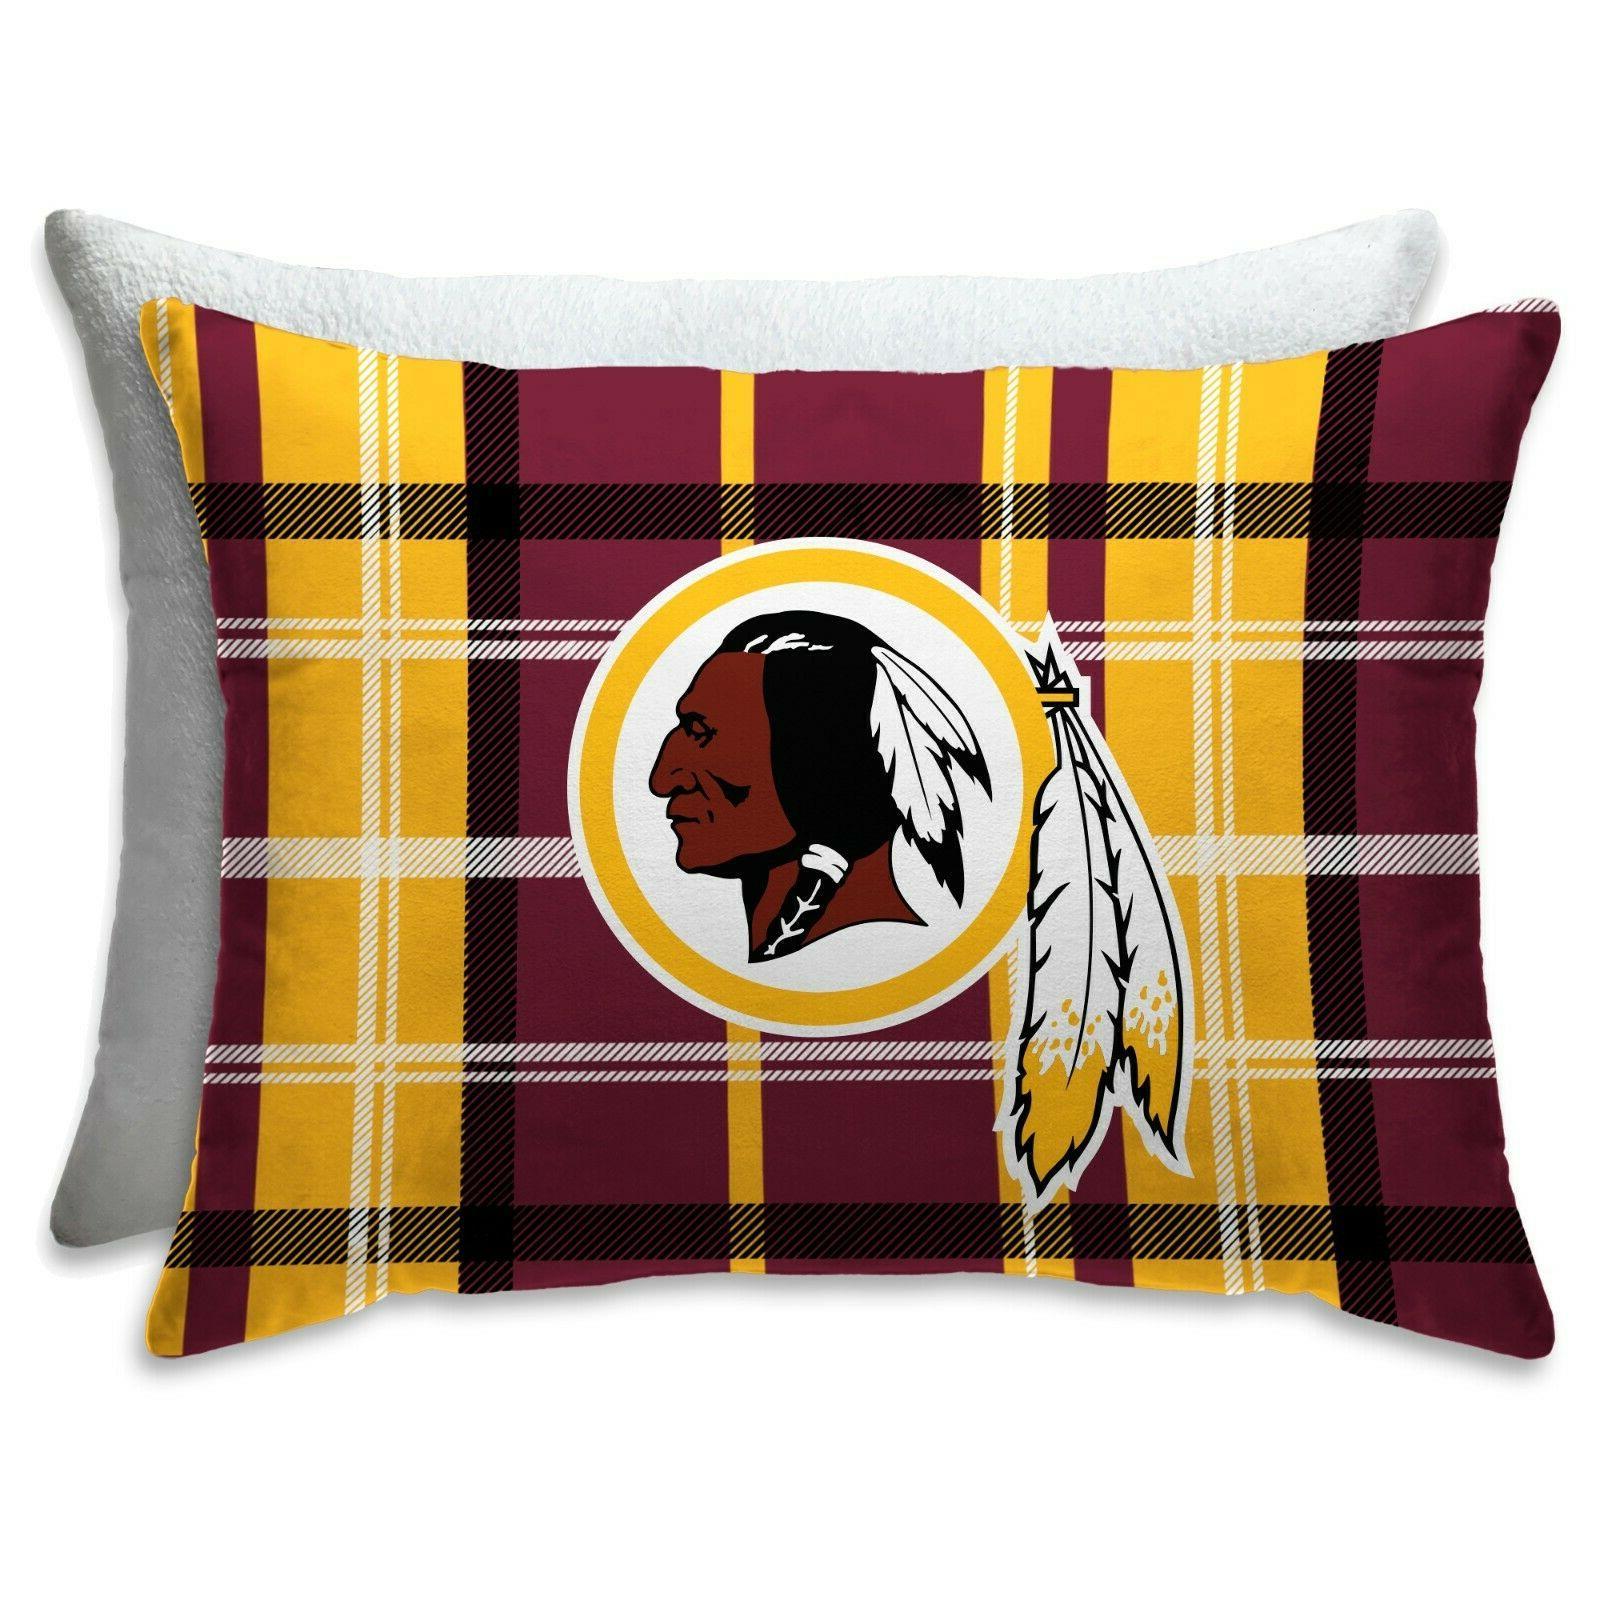 washington redskins nfl pillow full size plaid